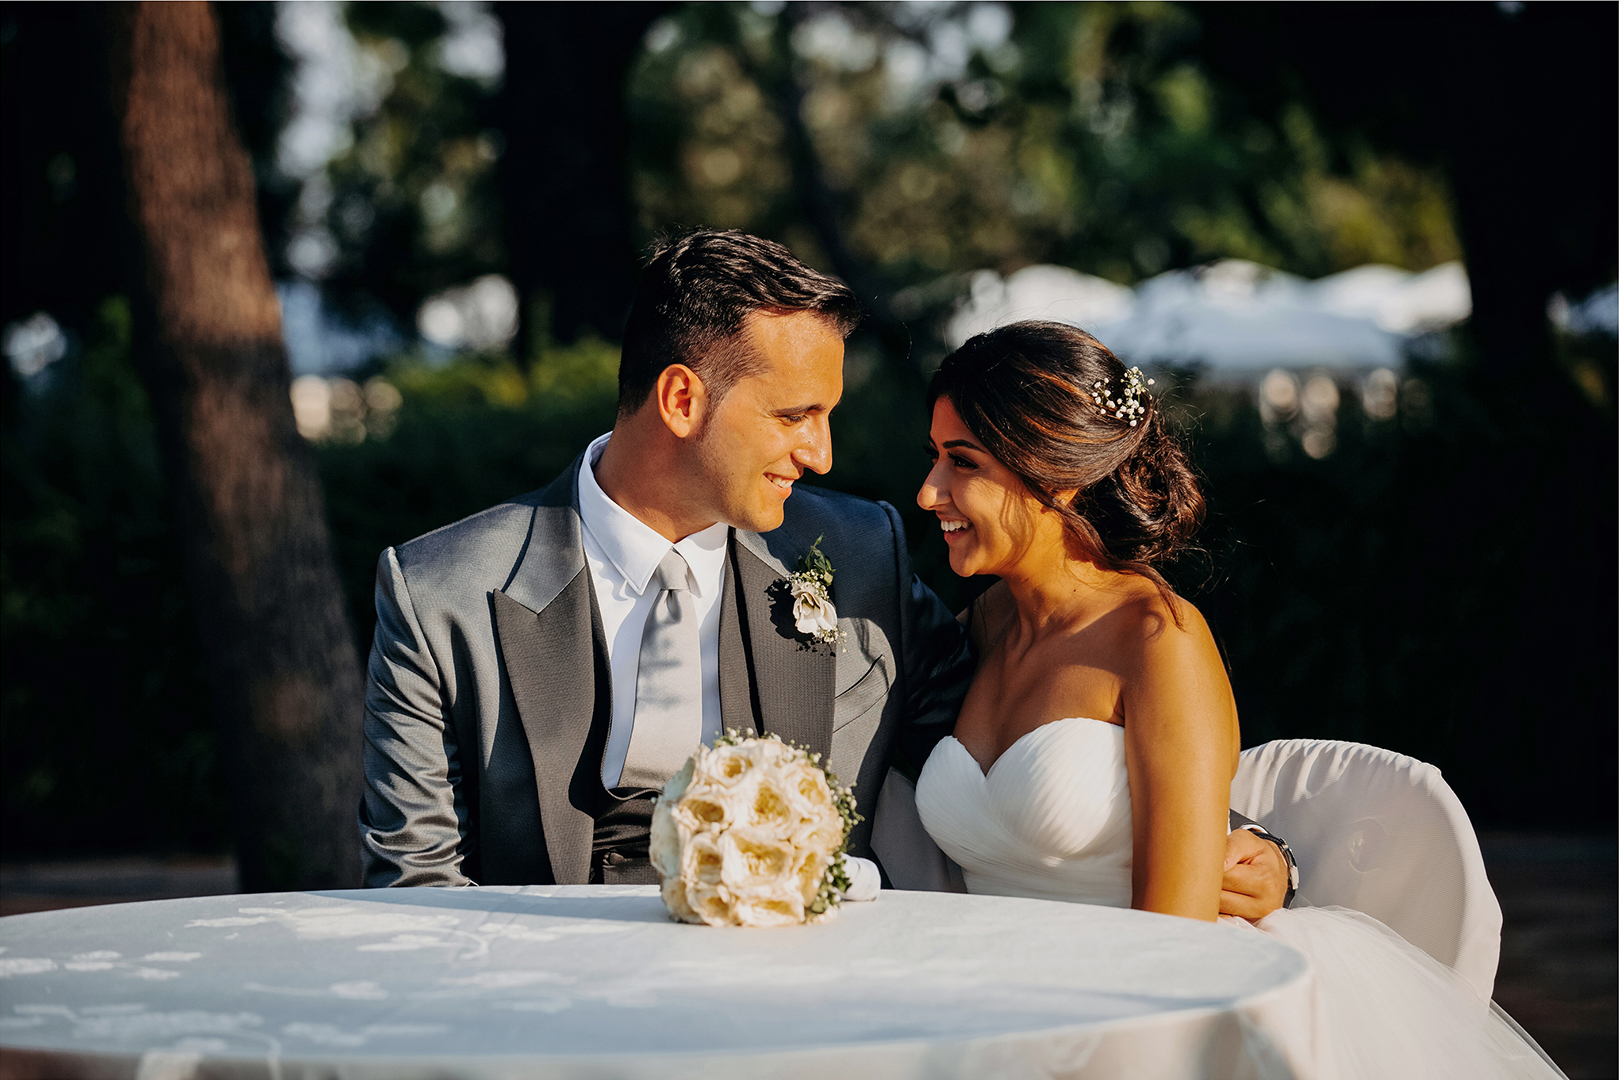 58 gianni-lepore-fotografo-foggia-torre-andriana-esterni-sala-sposi-bride-groom